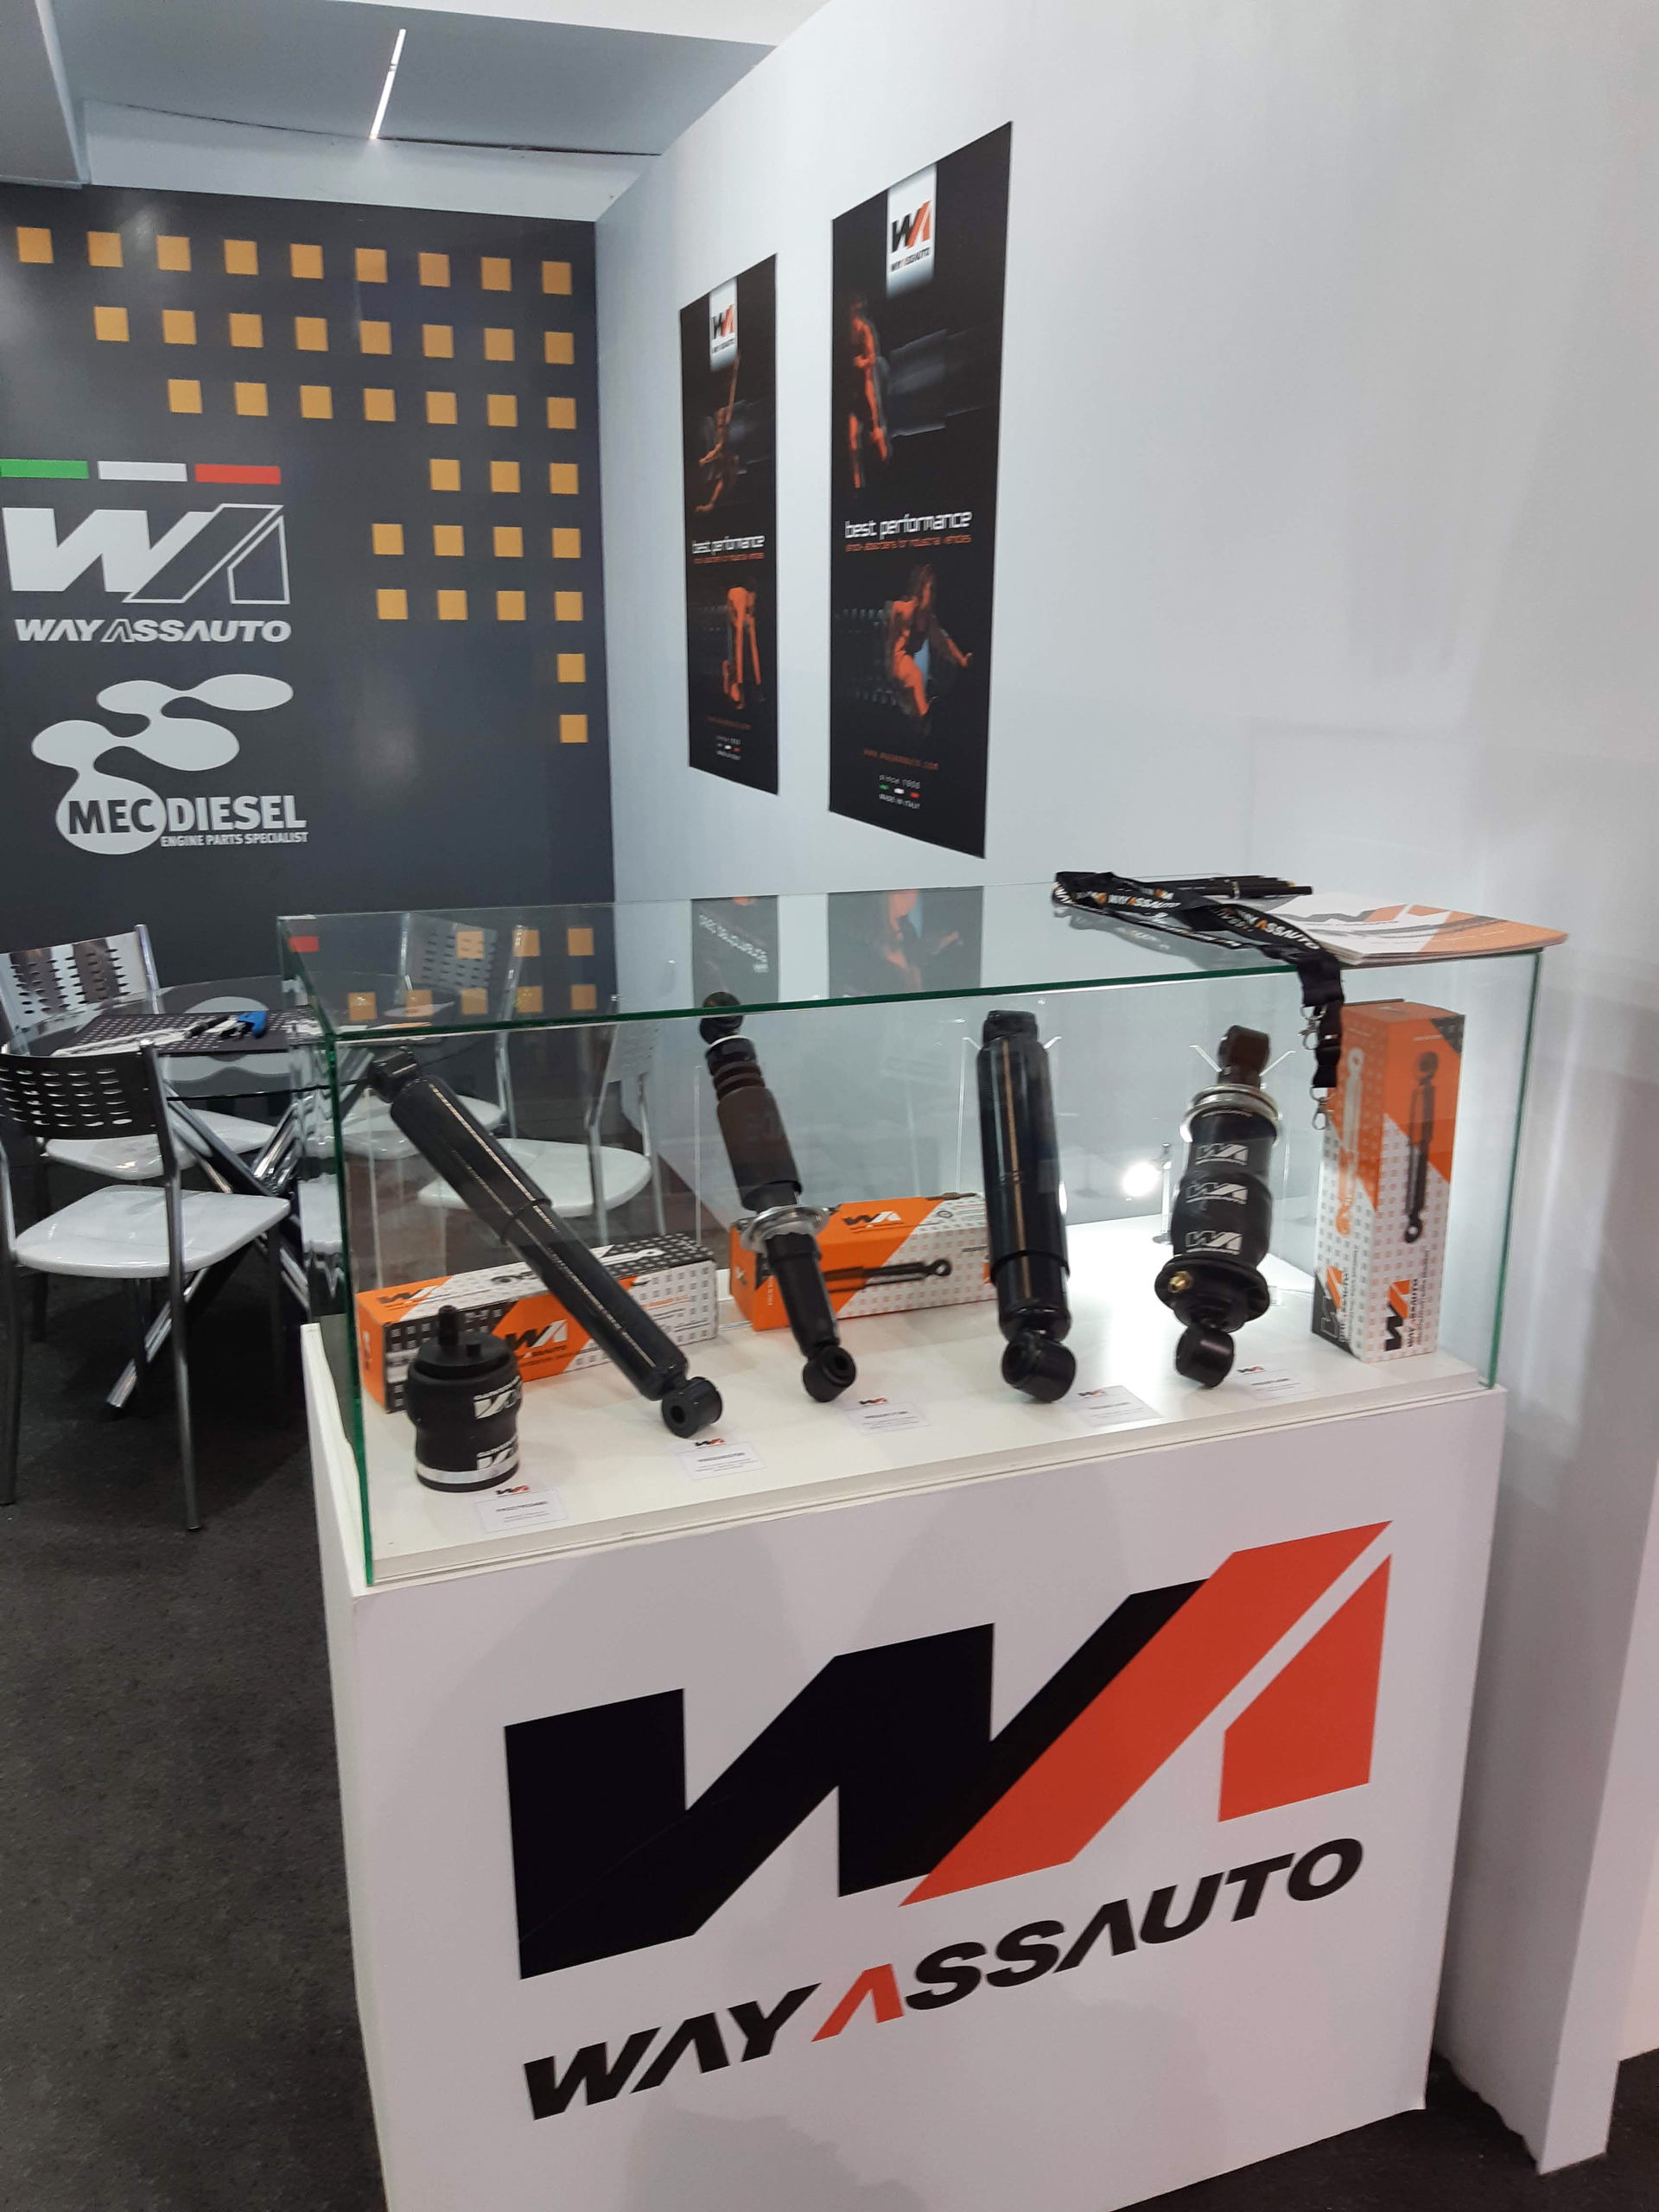 Automec-Sao-Paulo-23-27-Aprile-2019-Way-Assauto-1